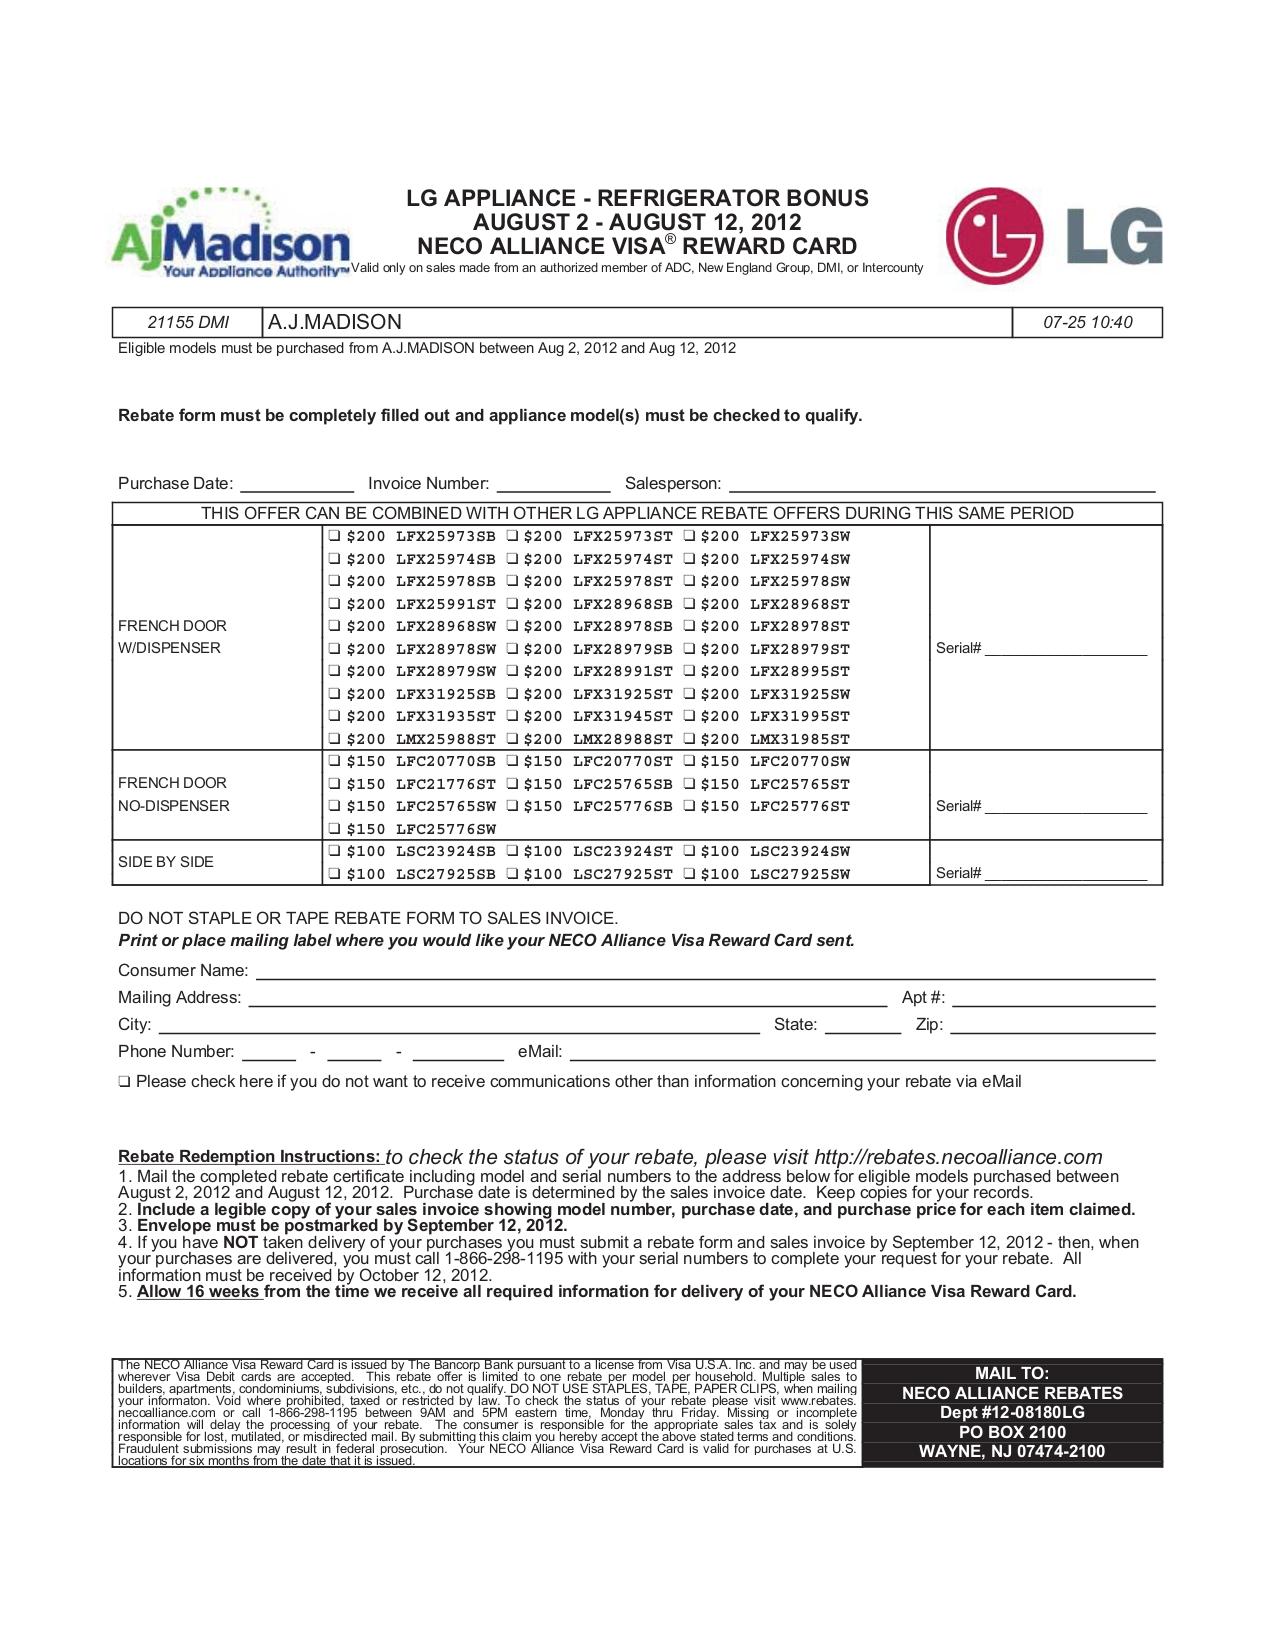 Download Free Pdf For Lg Lfc20770st Refrigerator Manual Schematics